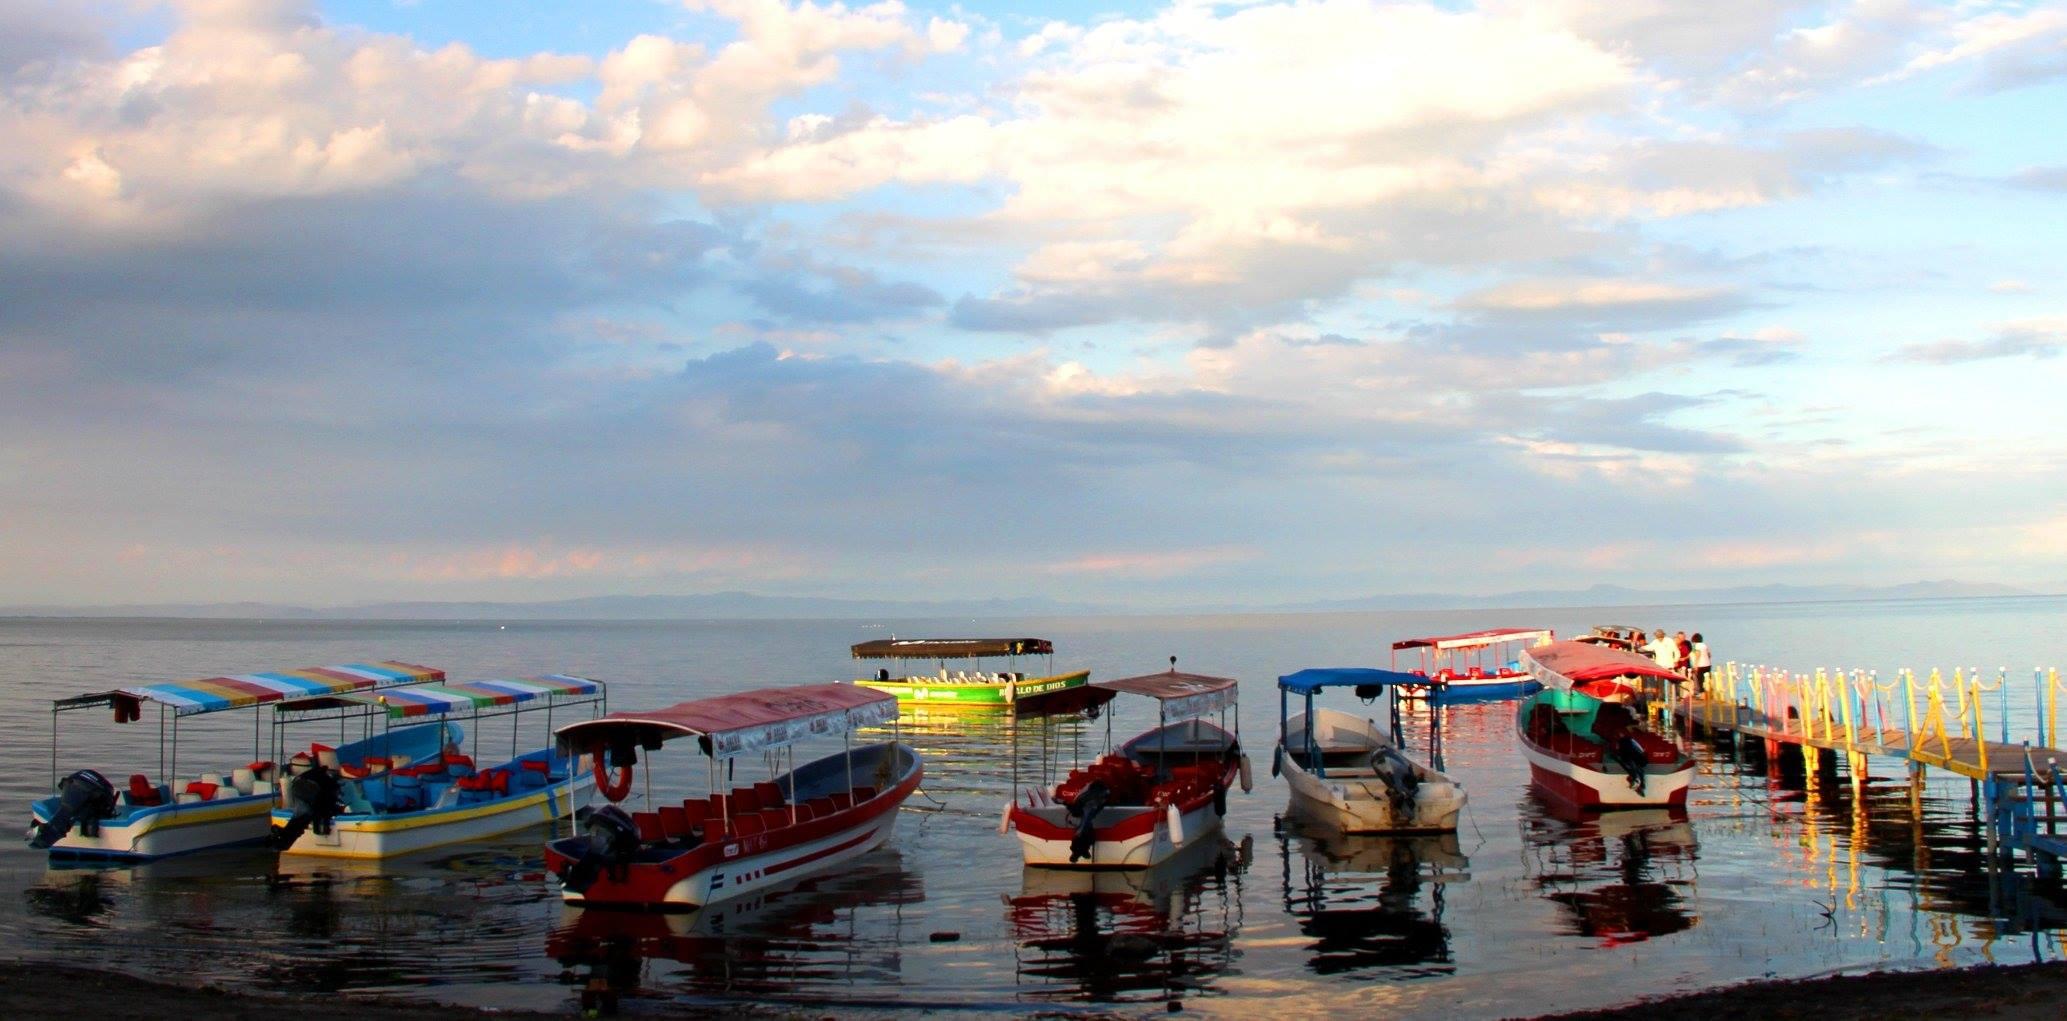 Lake of Nicaragua photo by Armando J. Cerrato